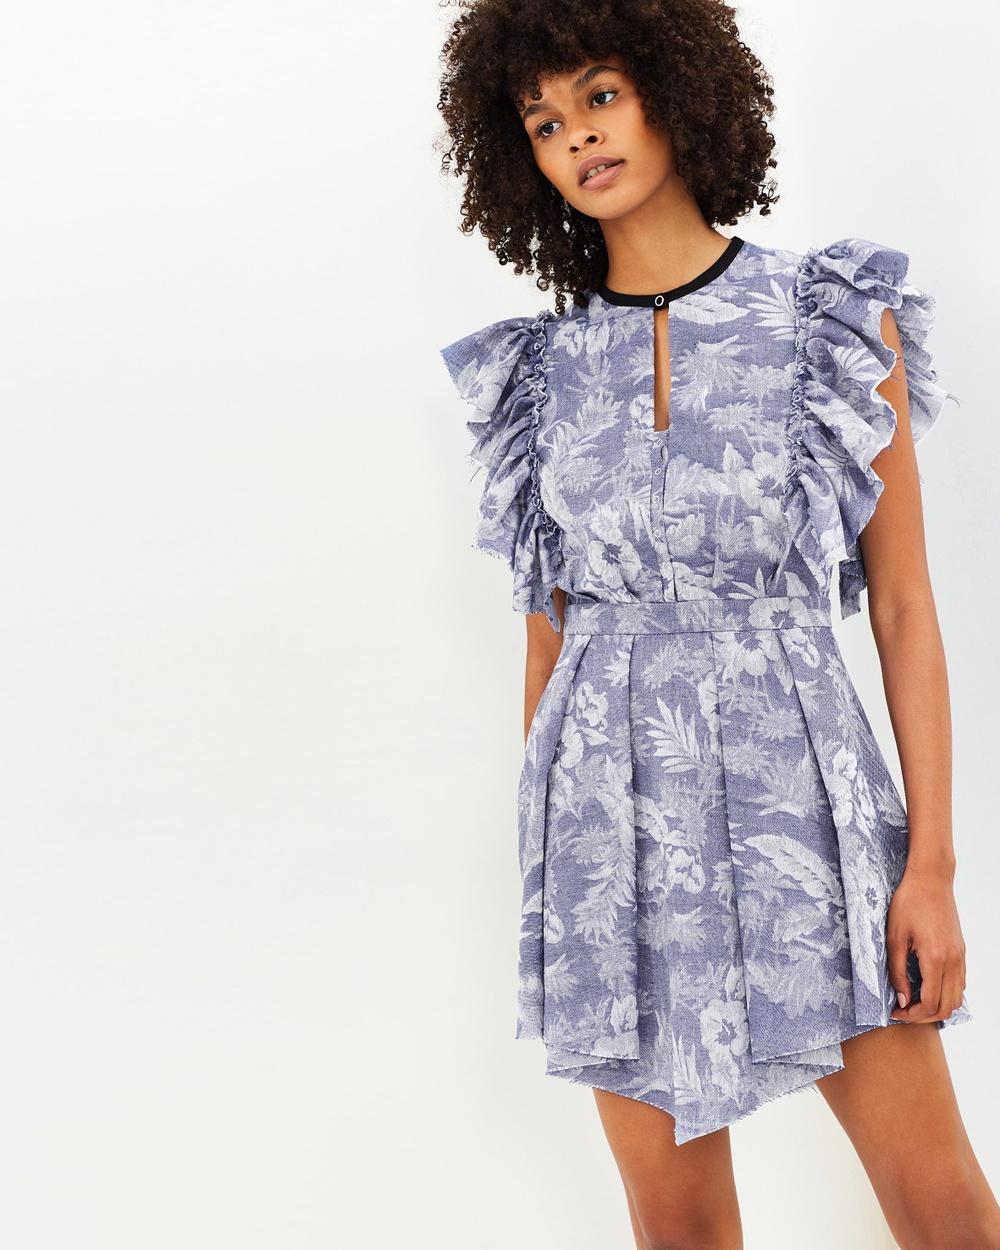 PFEIFFER Lanai Dress Printed Dresses Indigo Lanai Dress